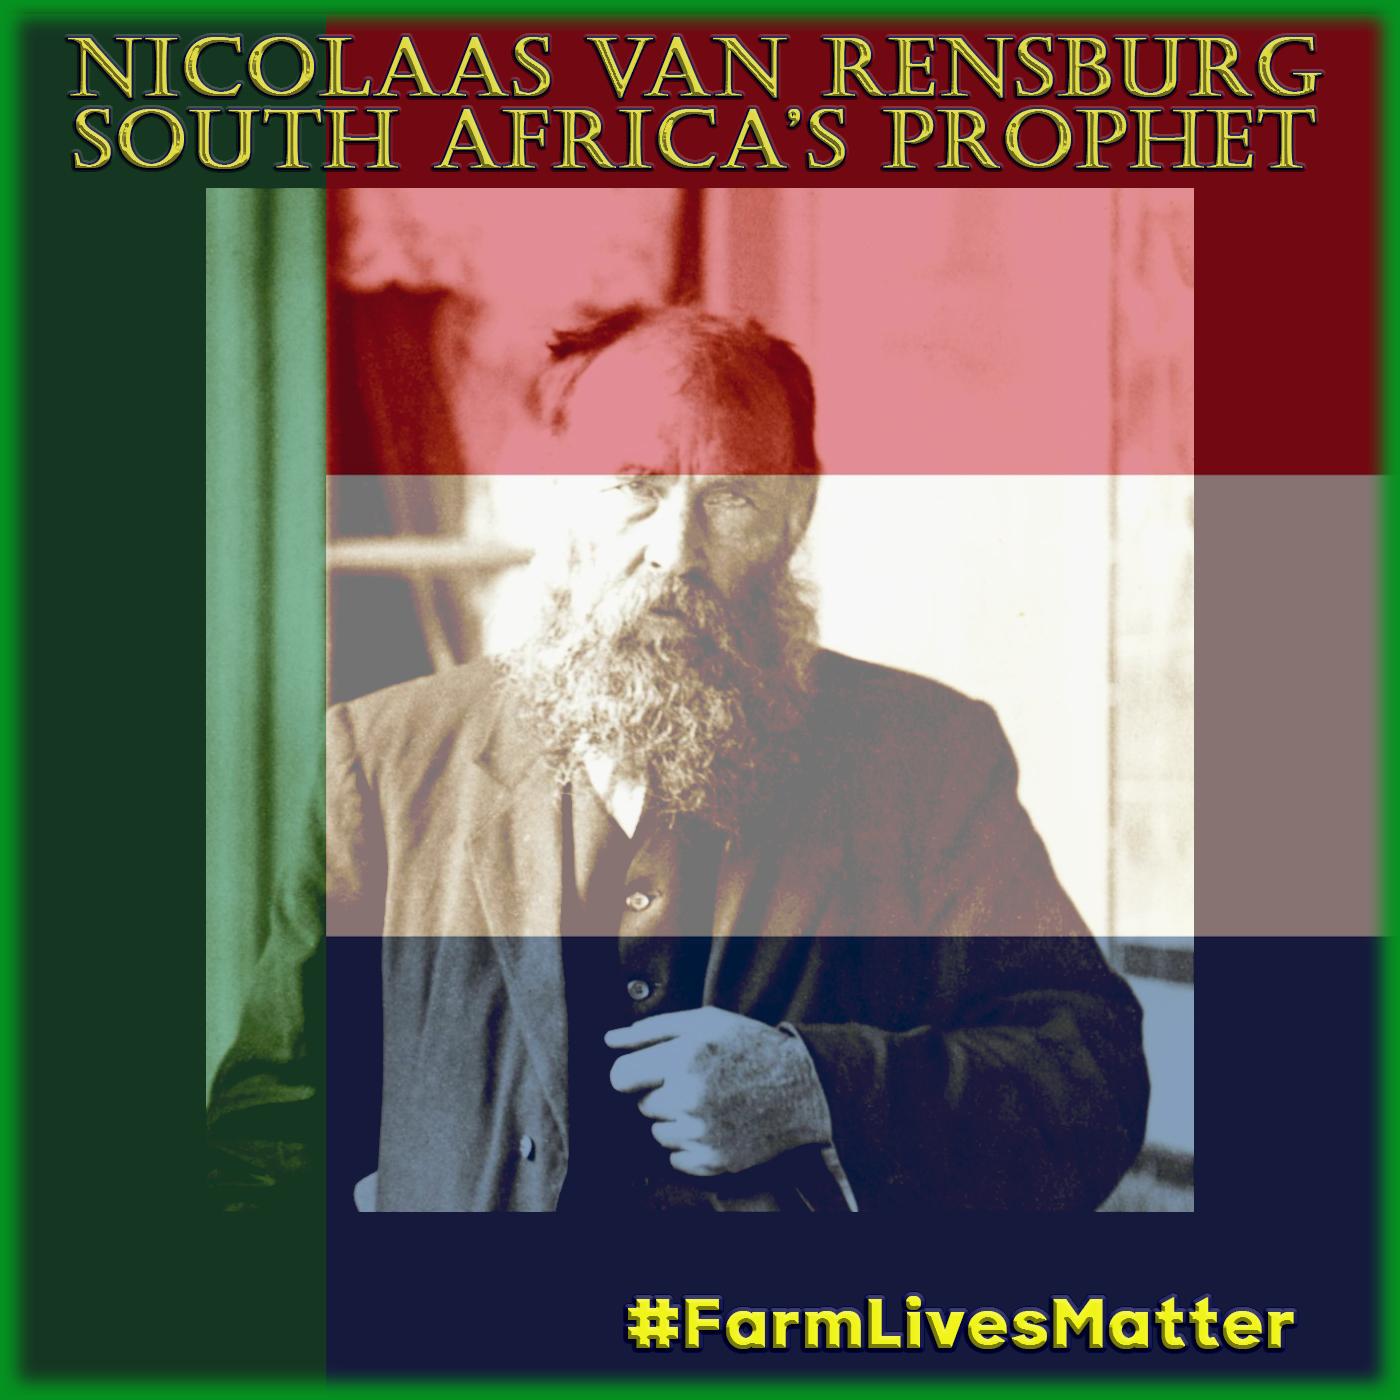 https://cdn.discordapp.com/attachments/424481712299442176/425057003031887874/Siener-van-Rensburg_Boer_Flag.png